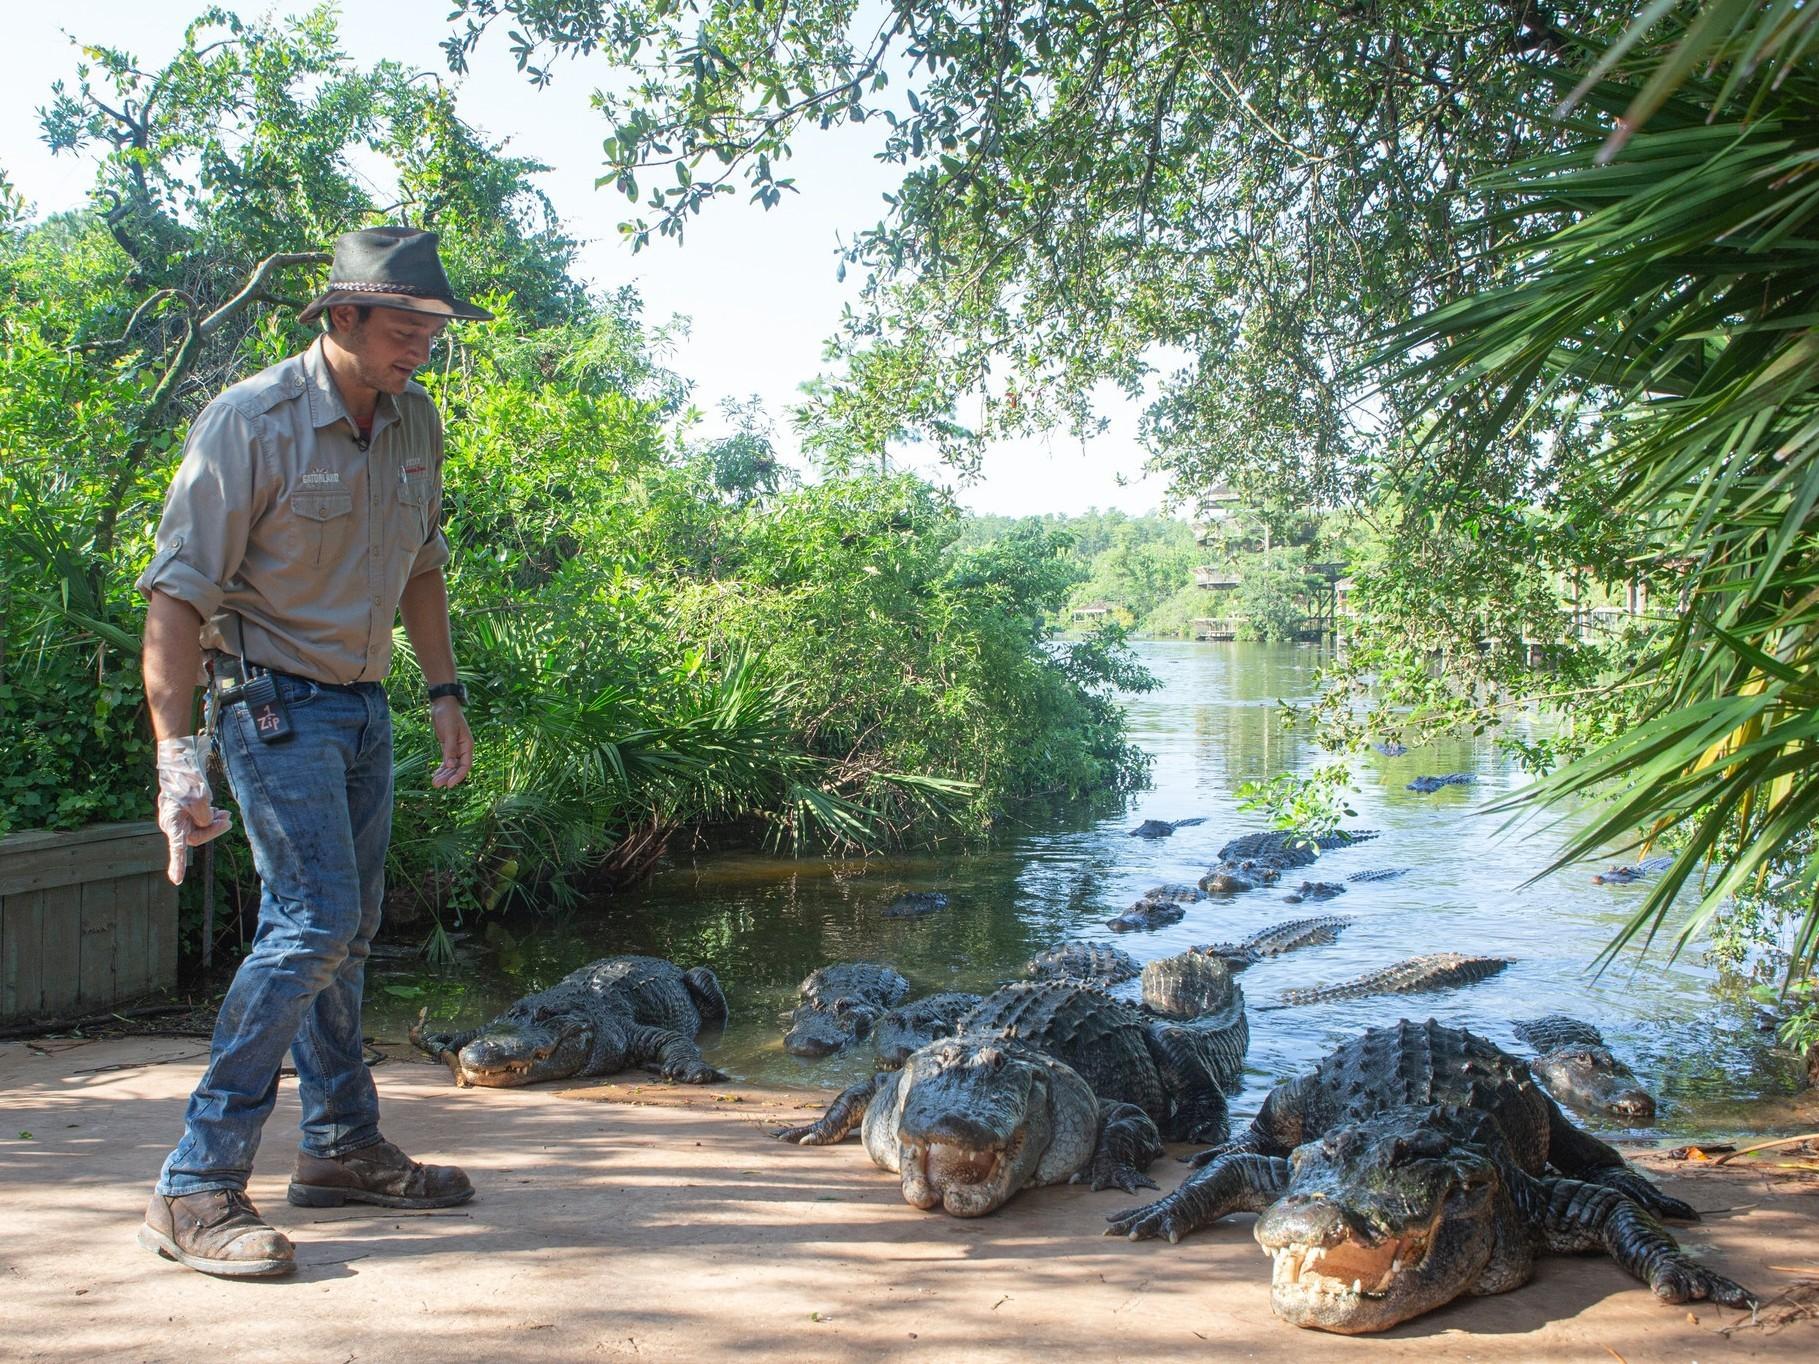 Gatorland half off for Florida residents